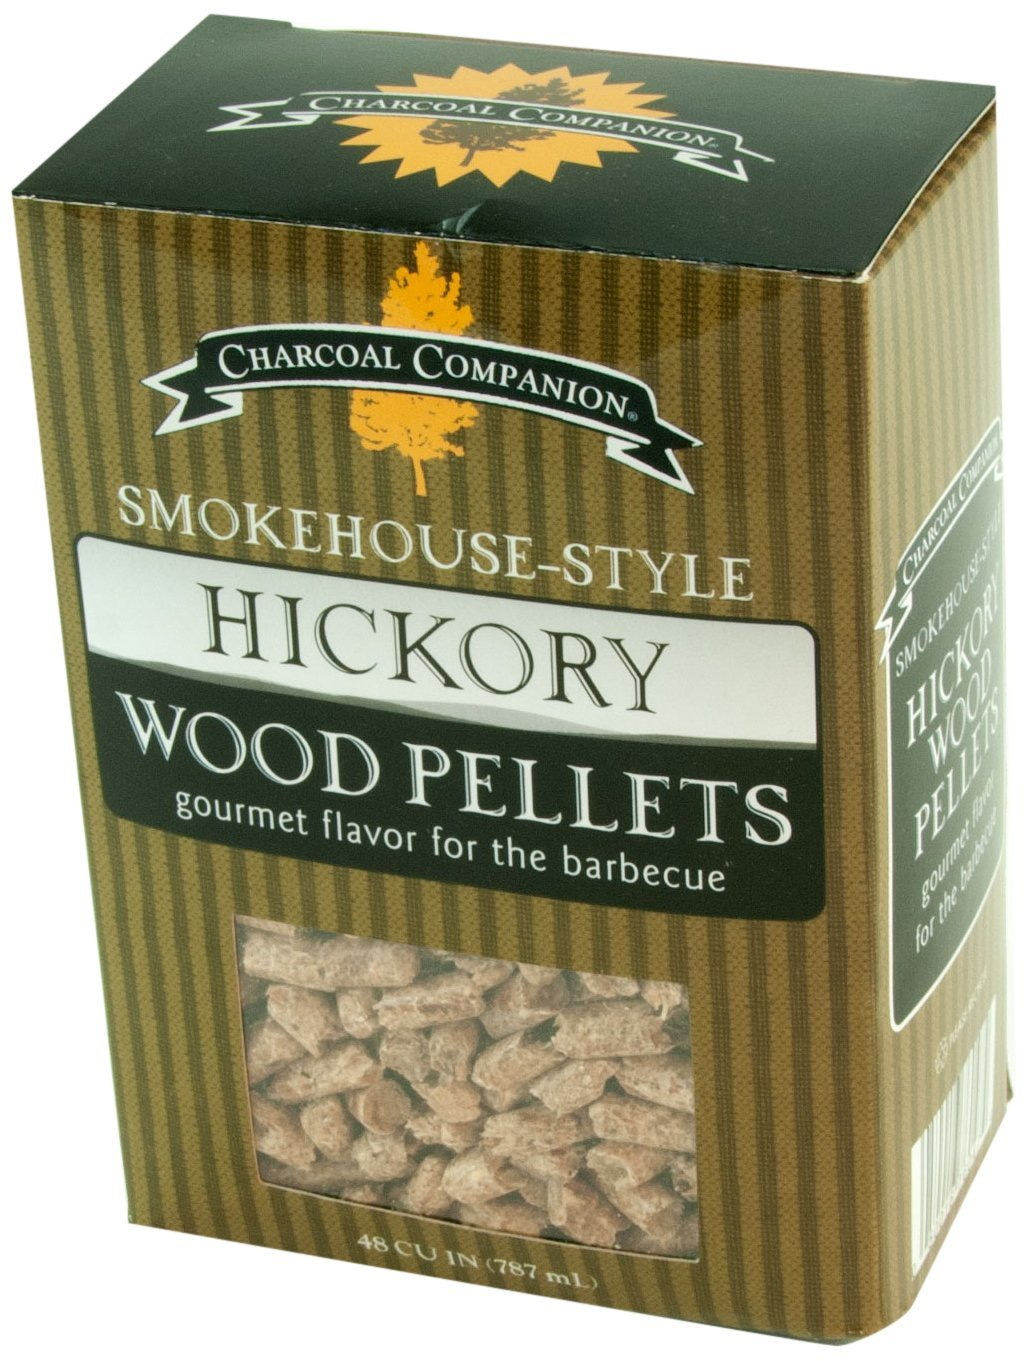 Charcoal Companion Smokehouse-Style Wood Pellets 1 lb (Hickory) - CC6047